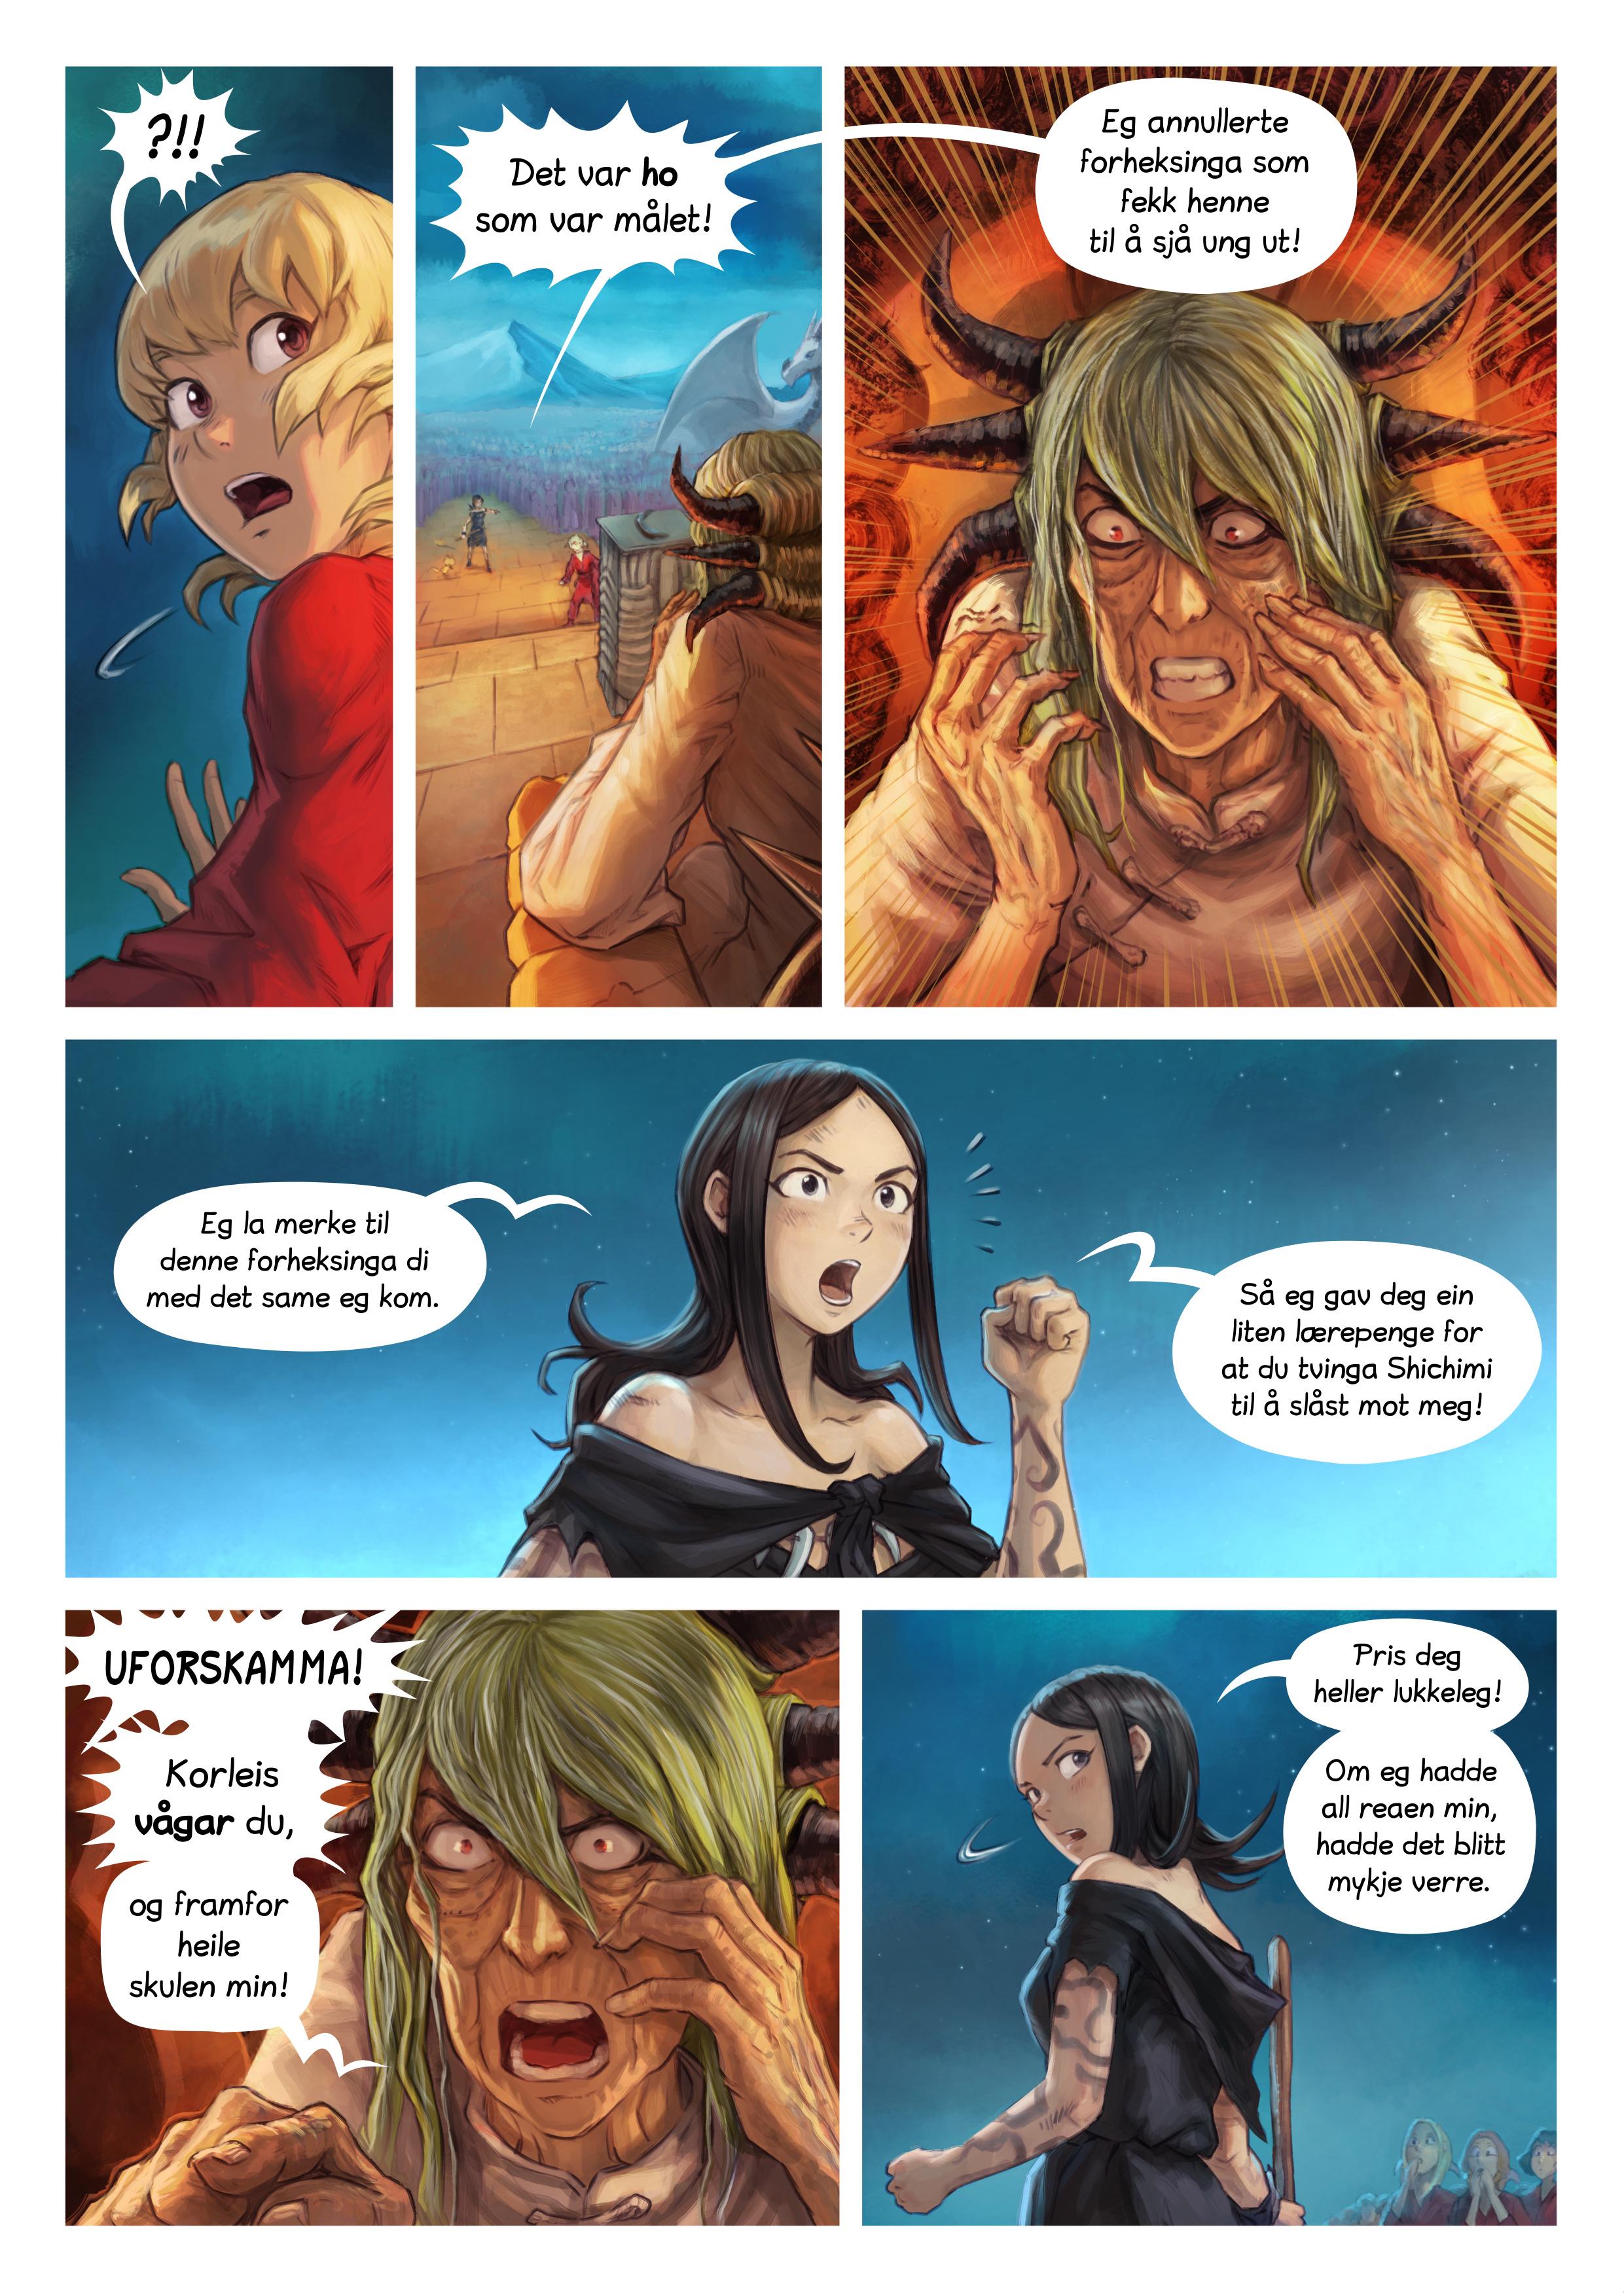 Episode 34: Riddarseremoni for Shichimi, Side 8